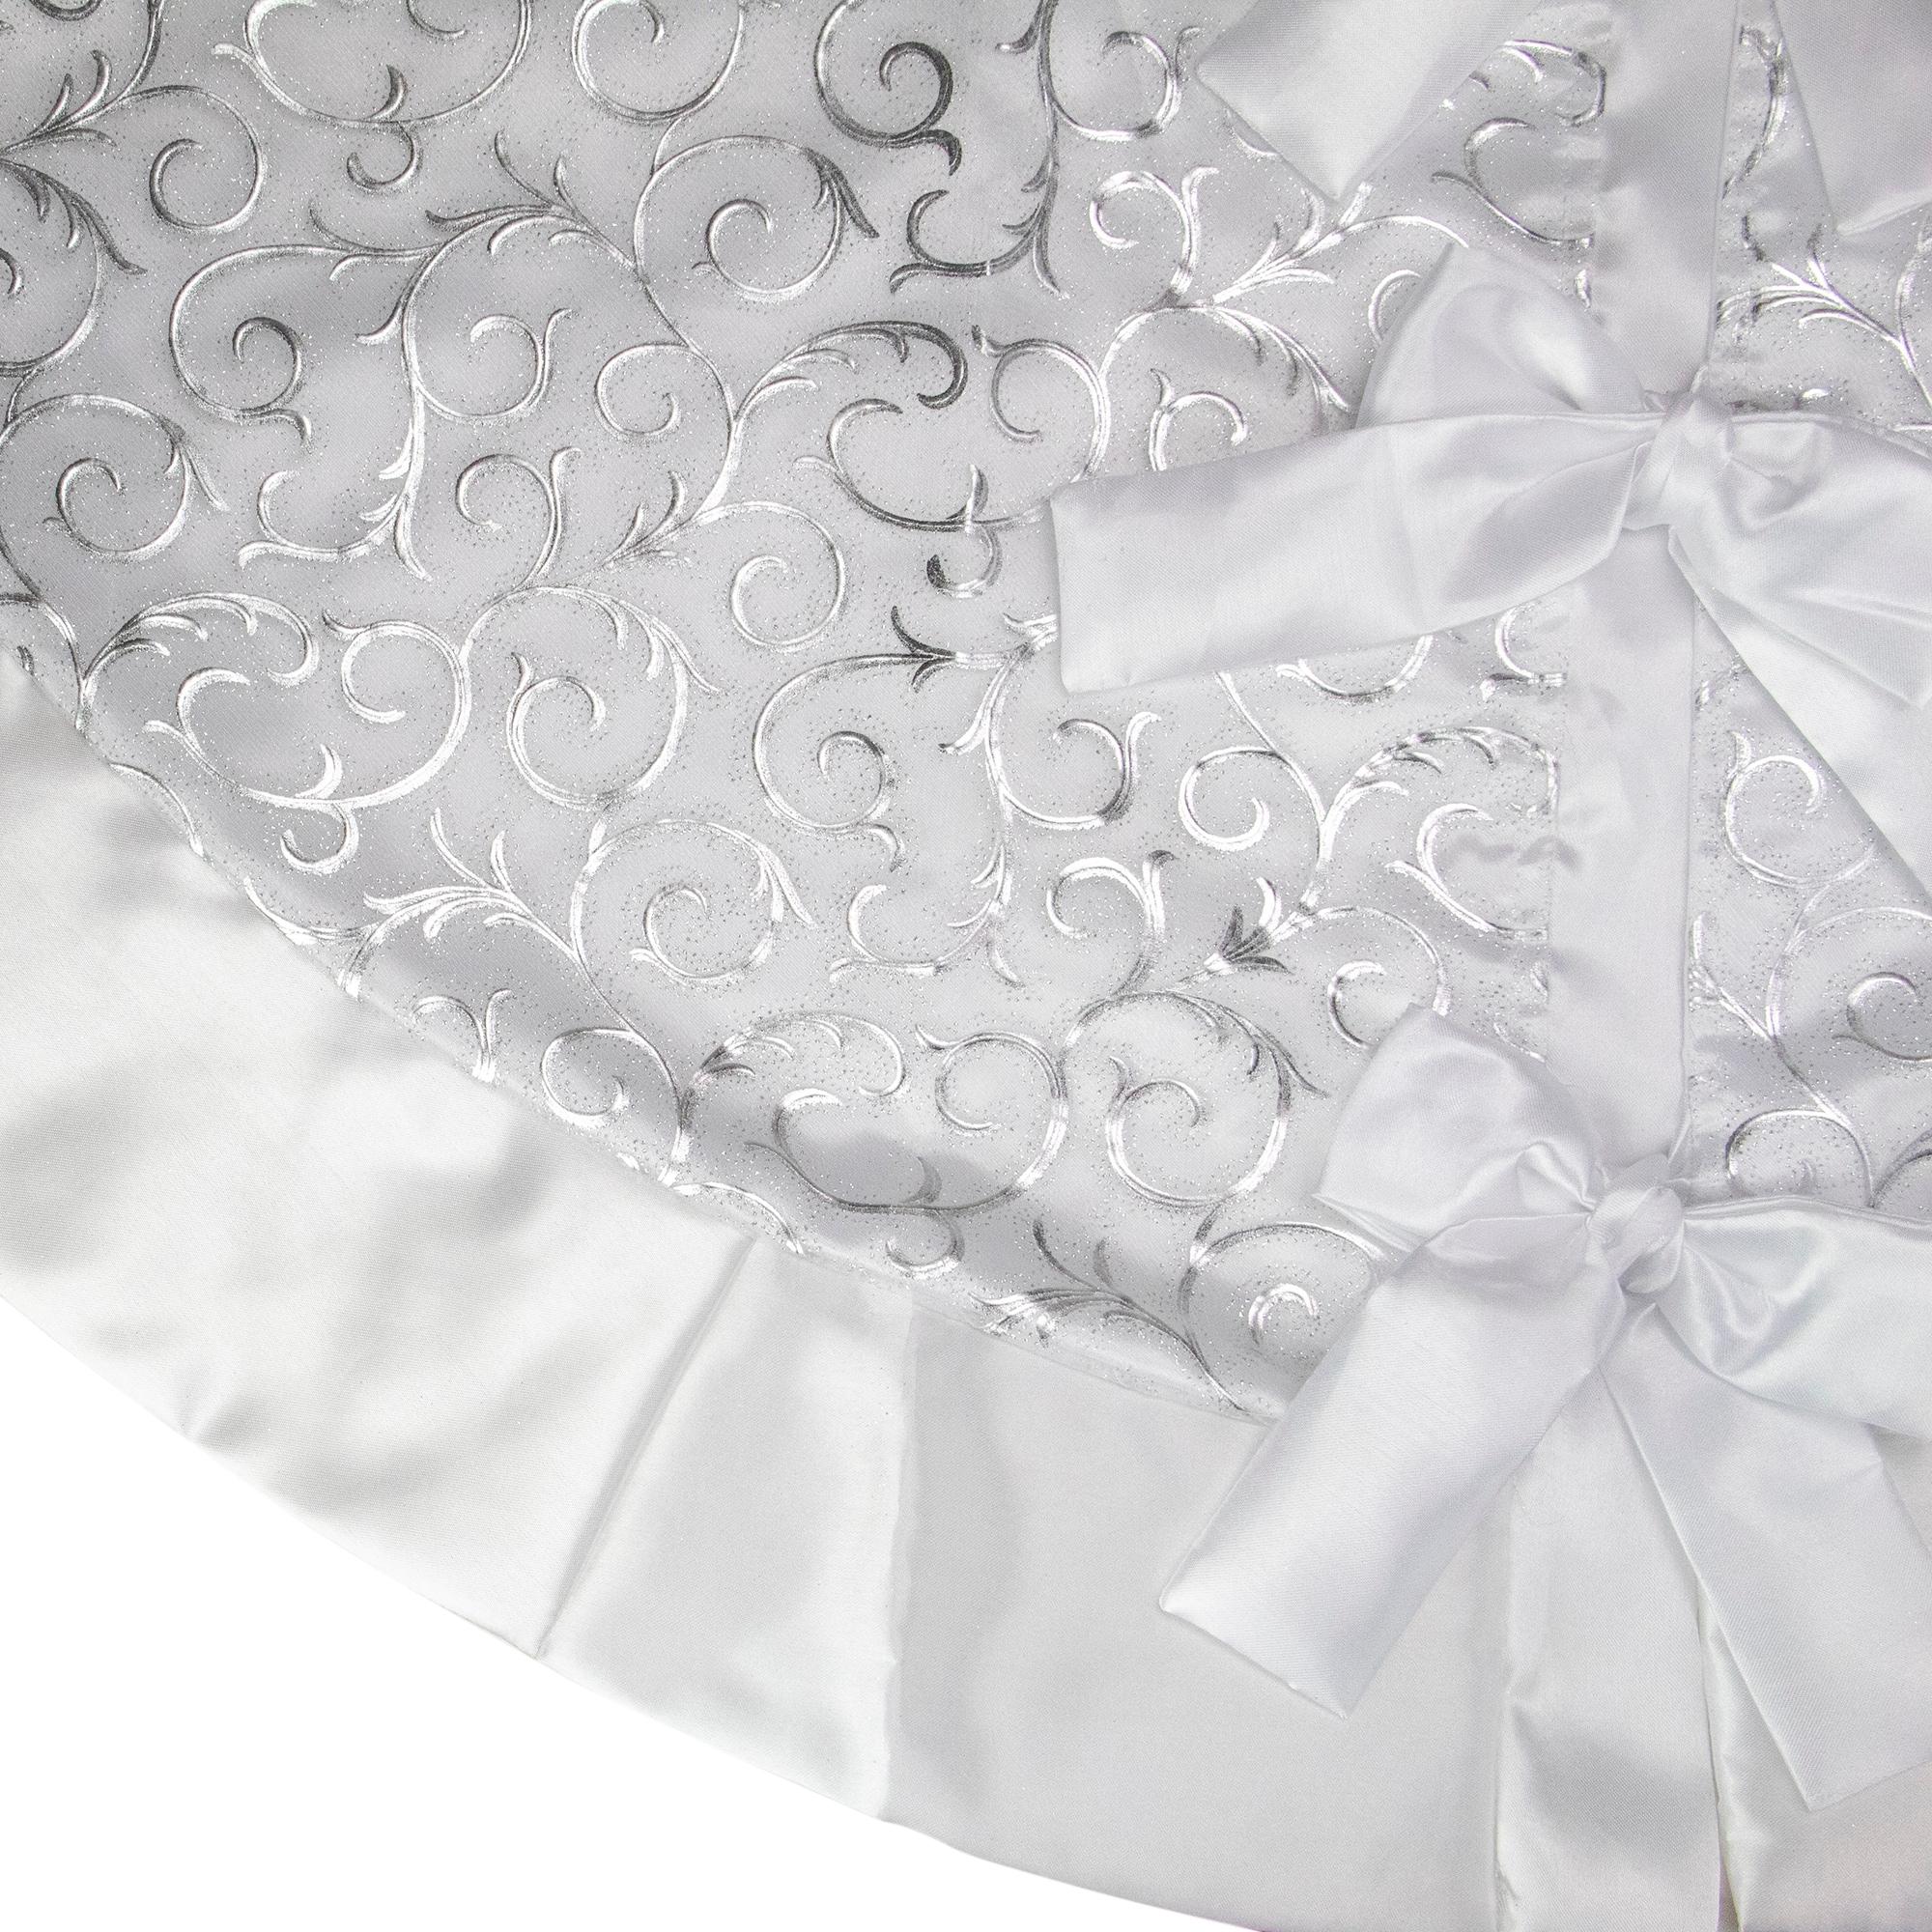 48 Silver Metallic Filigree Christmas Tree Skirt With Sateen Bows Overstock 18182191